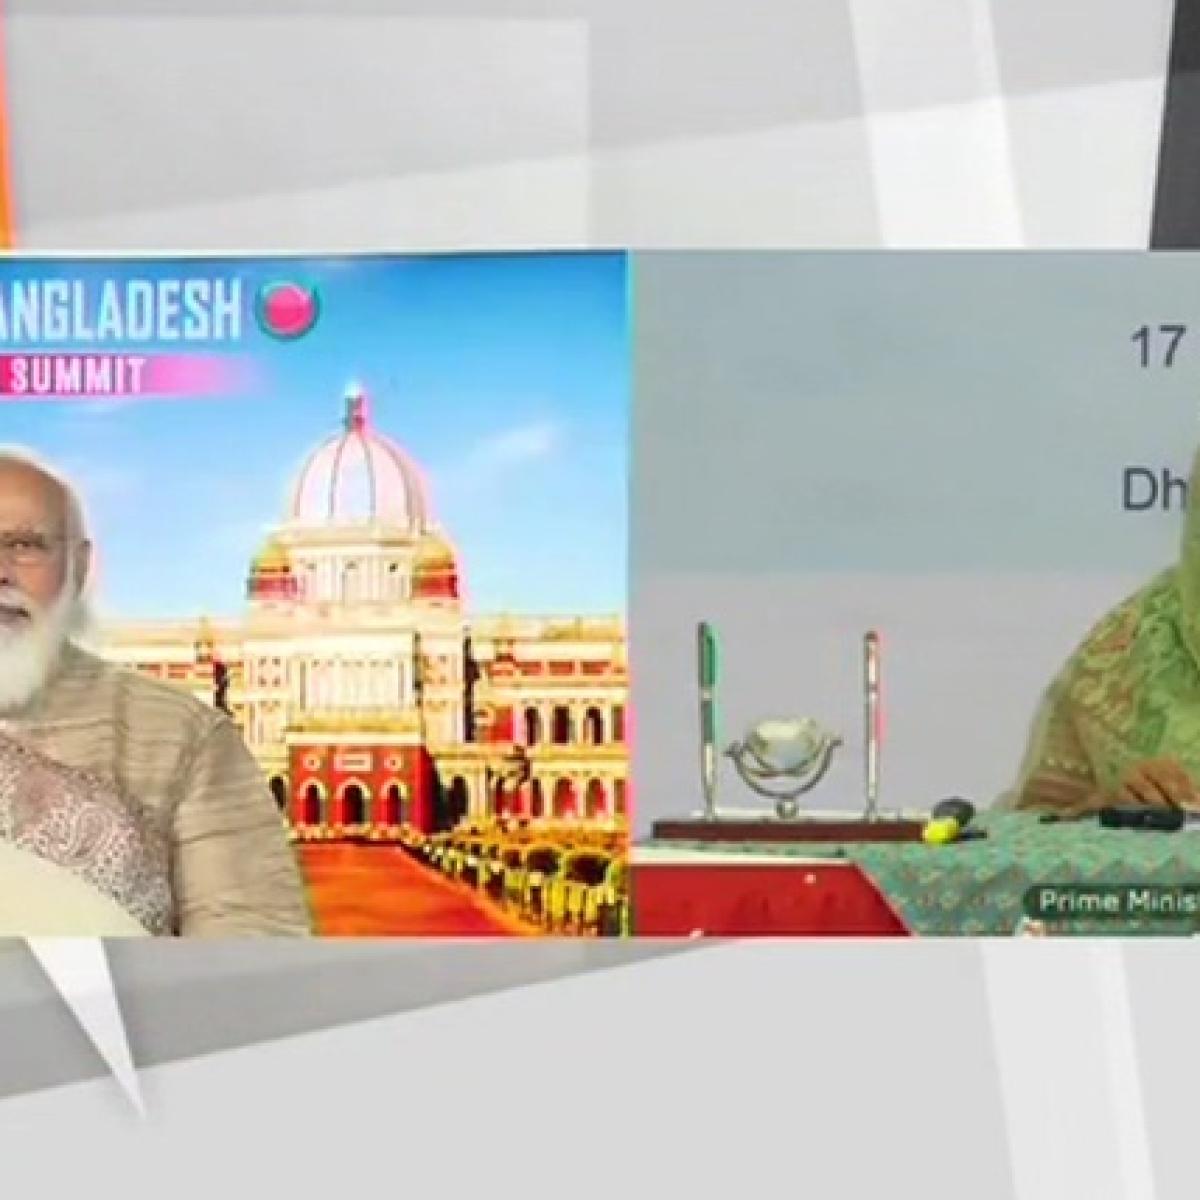 PM Modi, Sheikh Hasina jointly inaugurate Chilahati-Haldibari rail link between India, Bangladesh